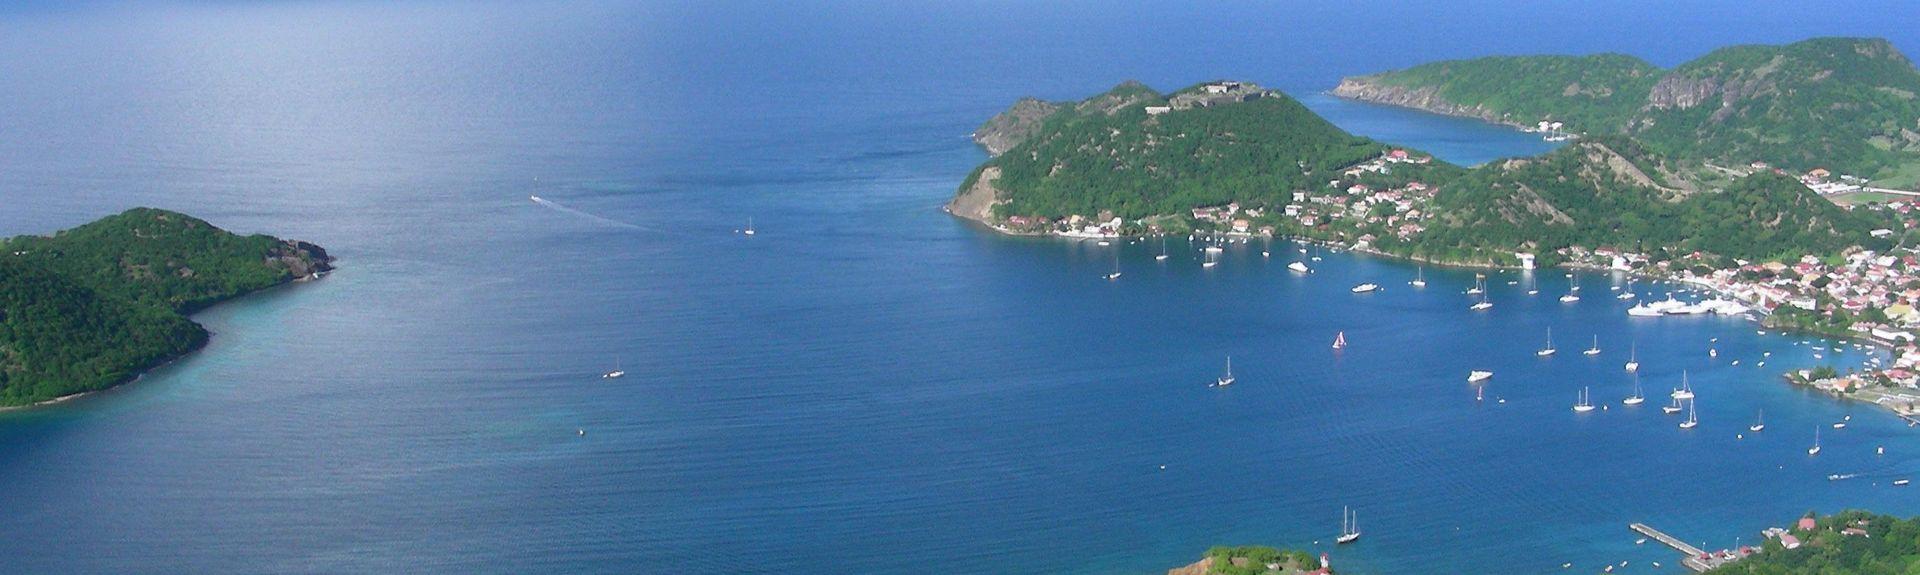 Guadeloupe National Park, Basse-Terre Island, Guadeloupe